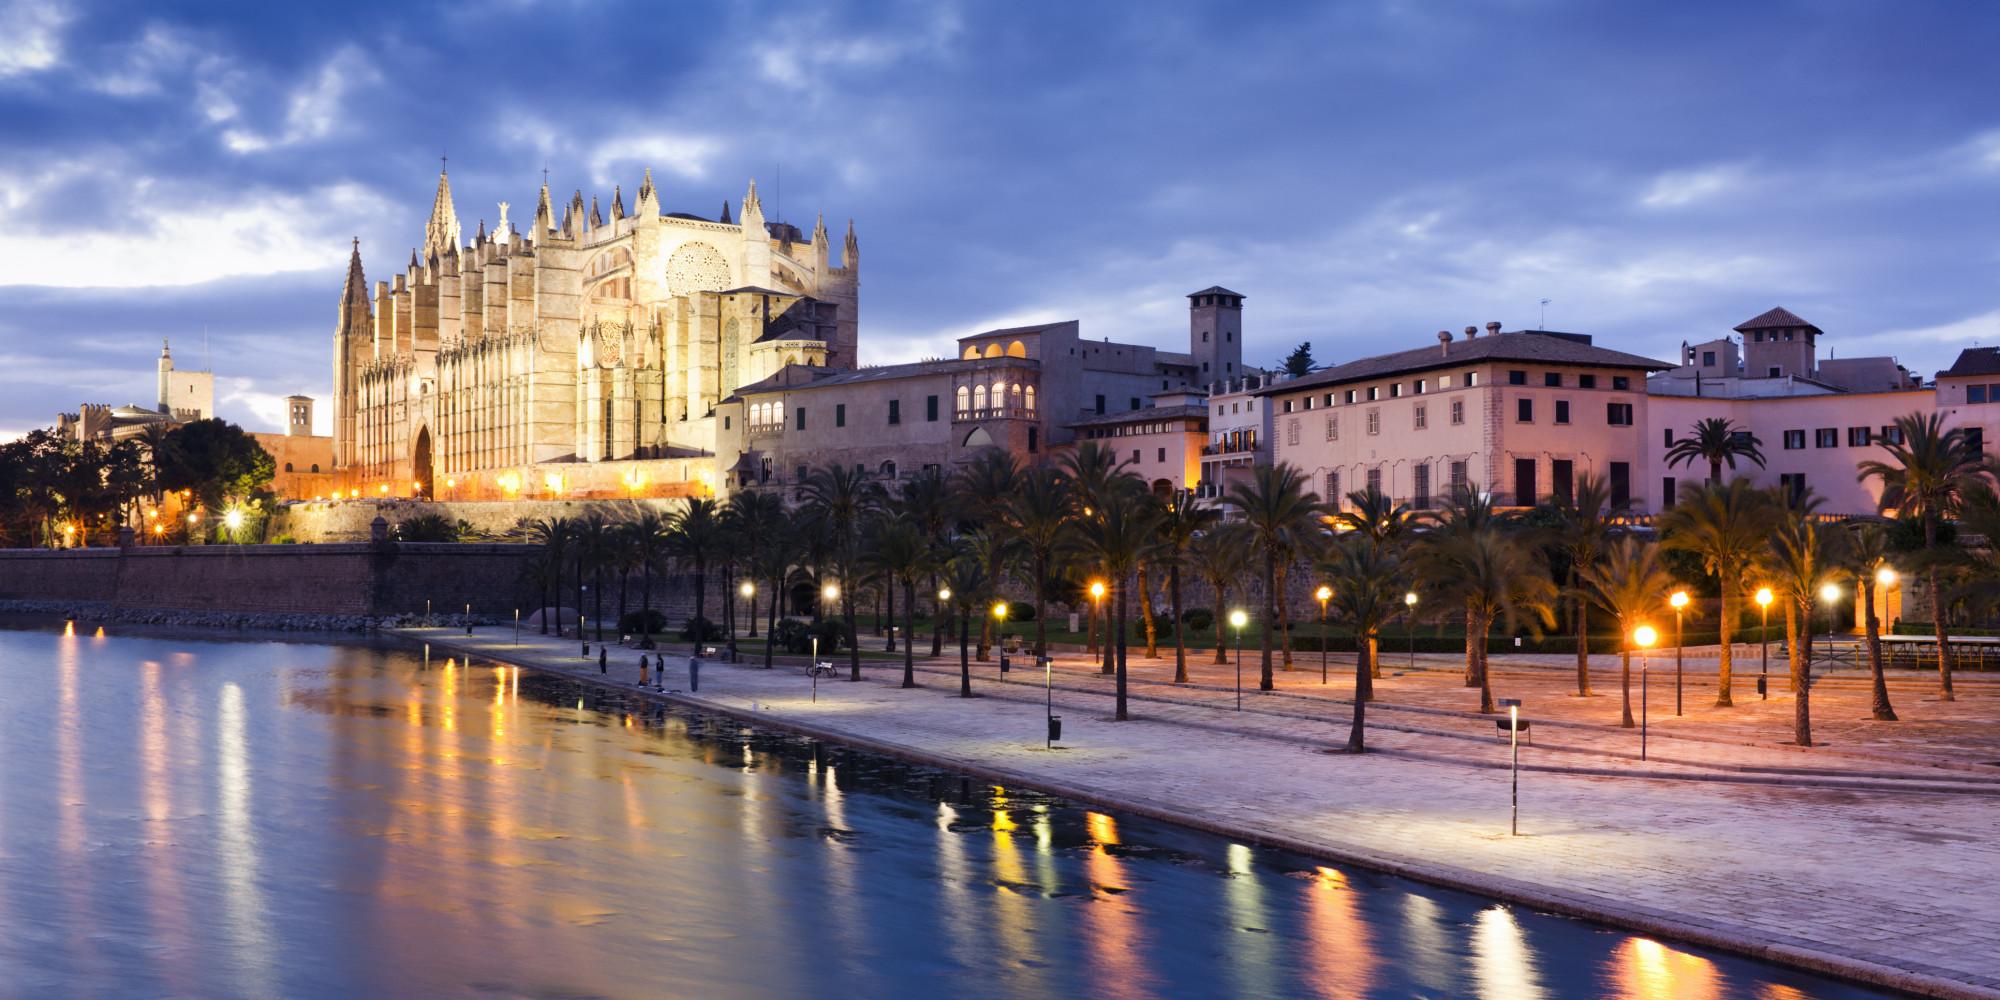 4 reasons to visit palma de mallorca huffpost - Mallorca pictures ...